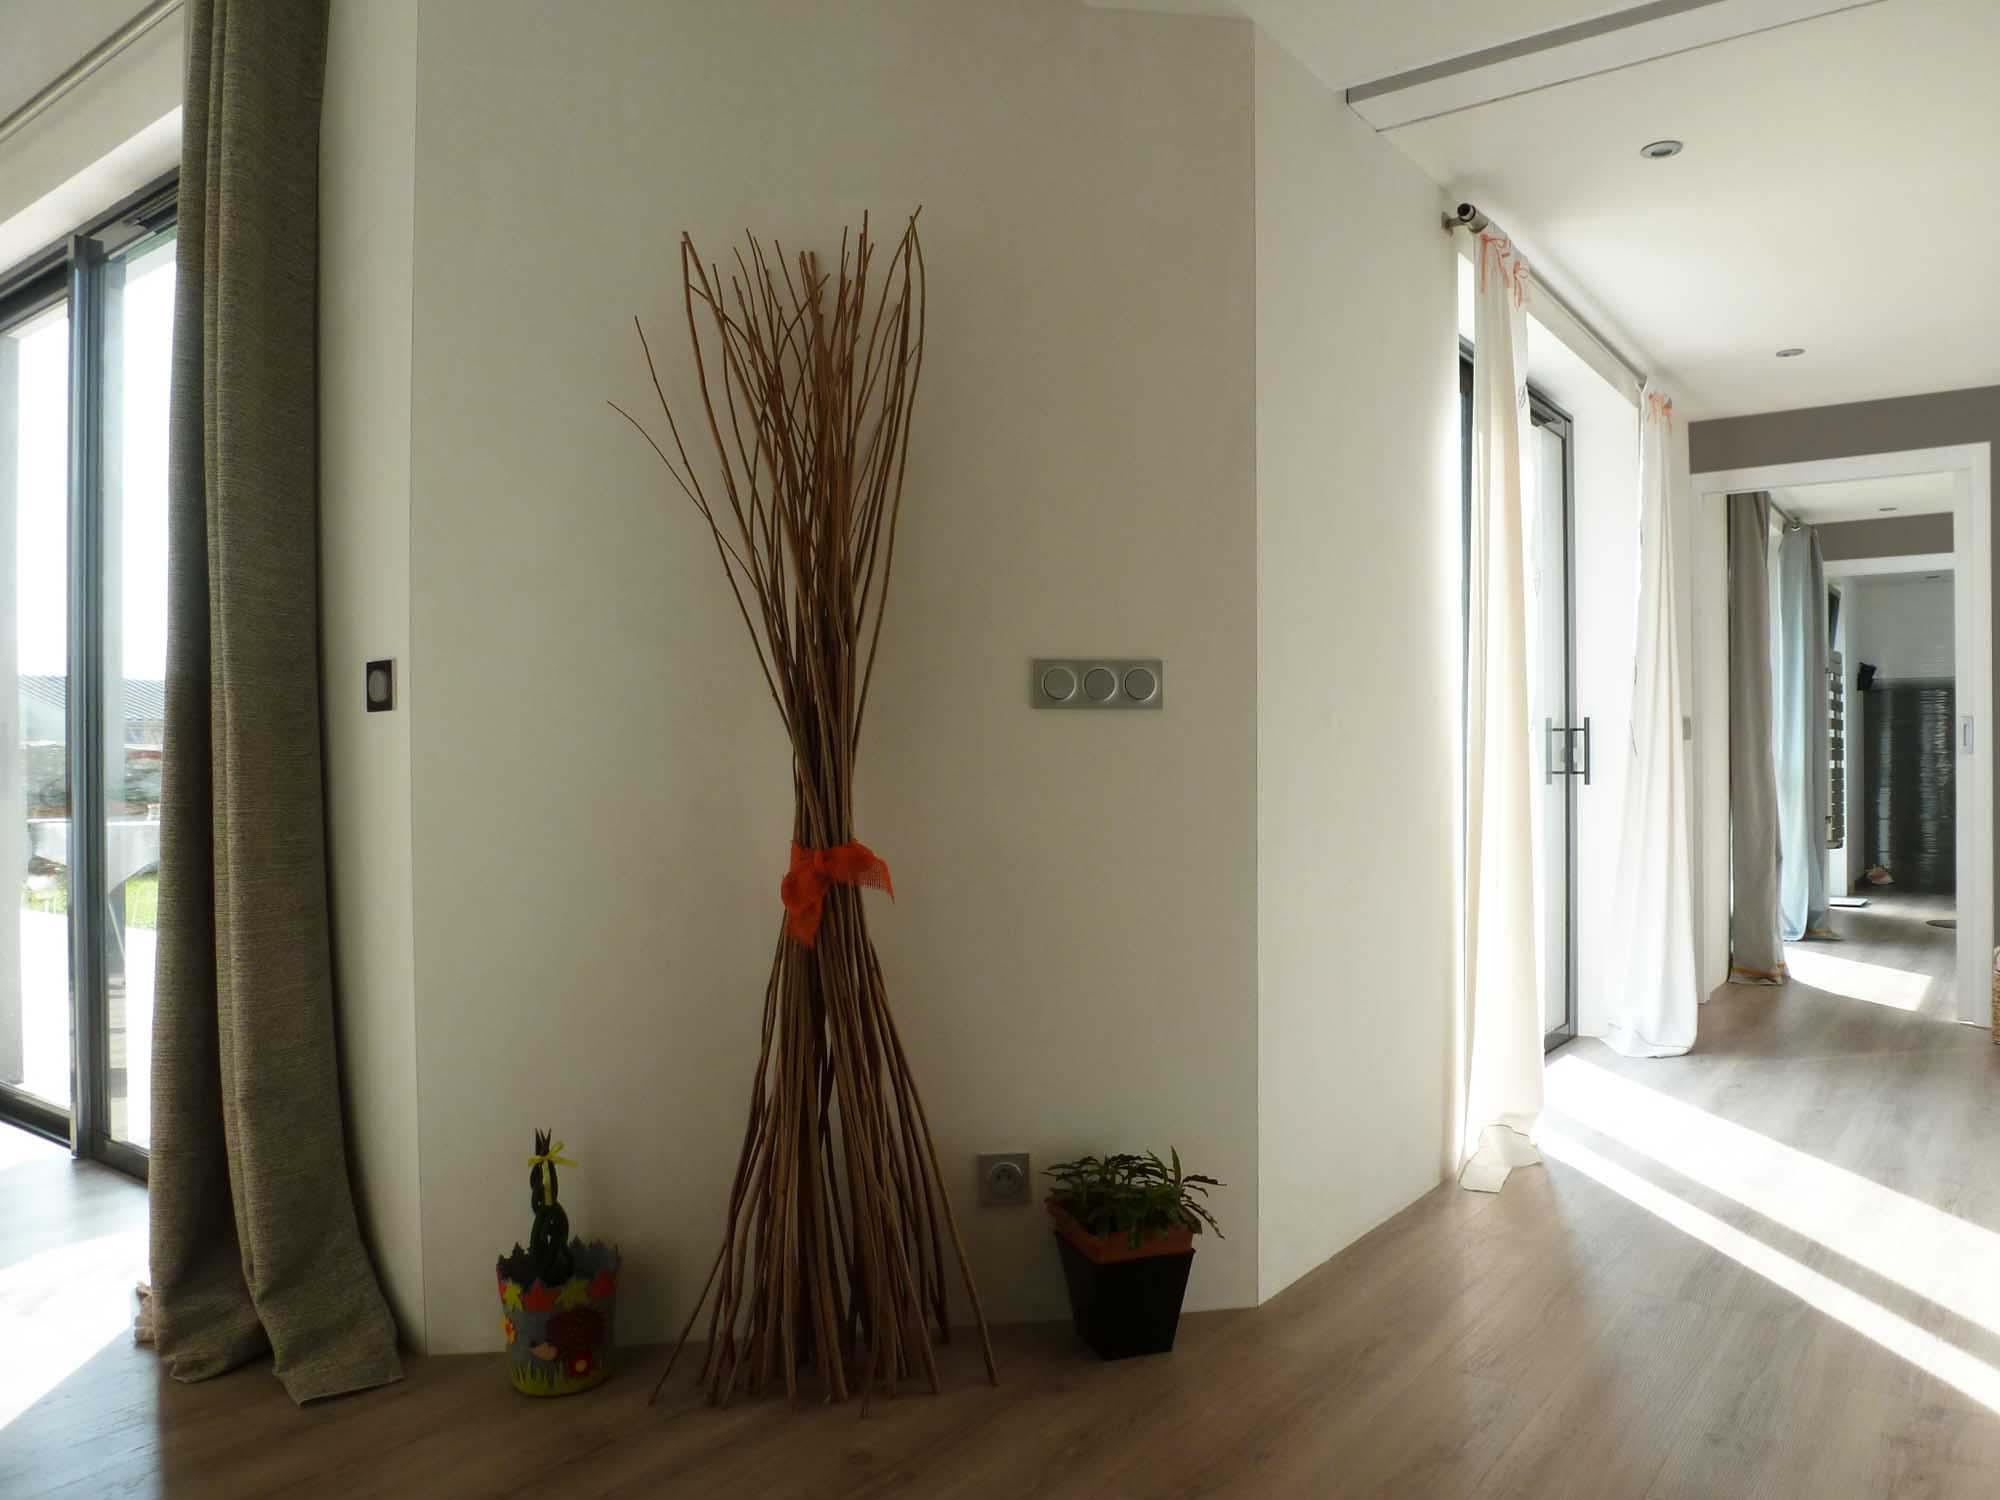 Habitation st gildas couedel design herve couedel for Design d interieur st hyacinthe